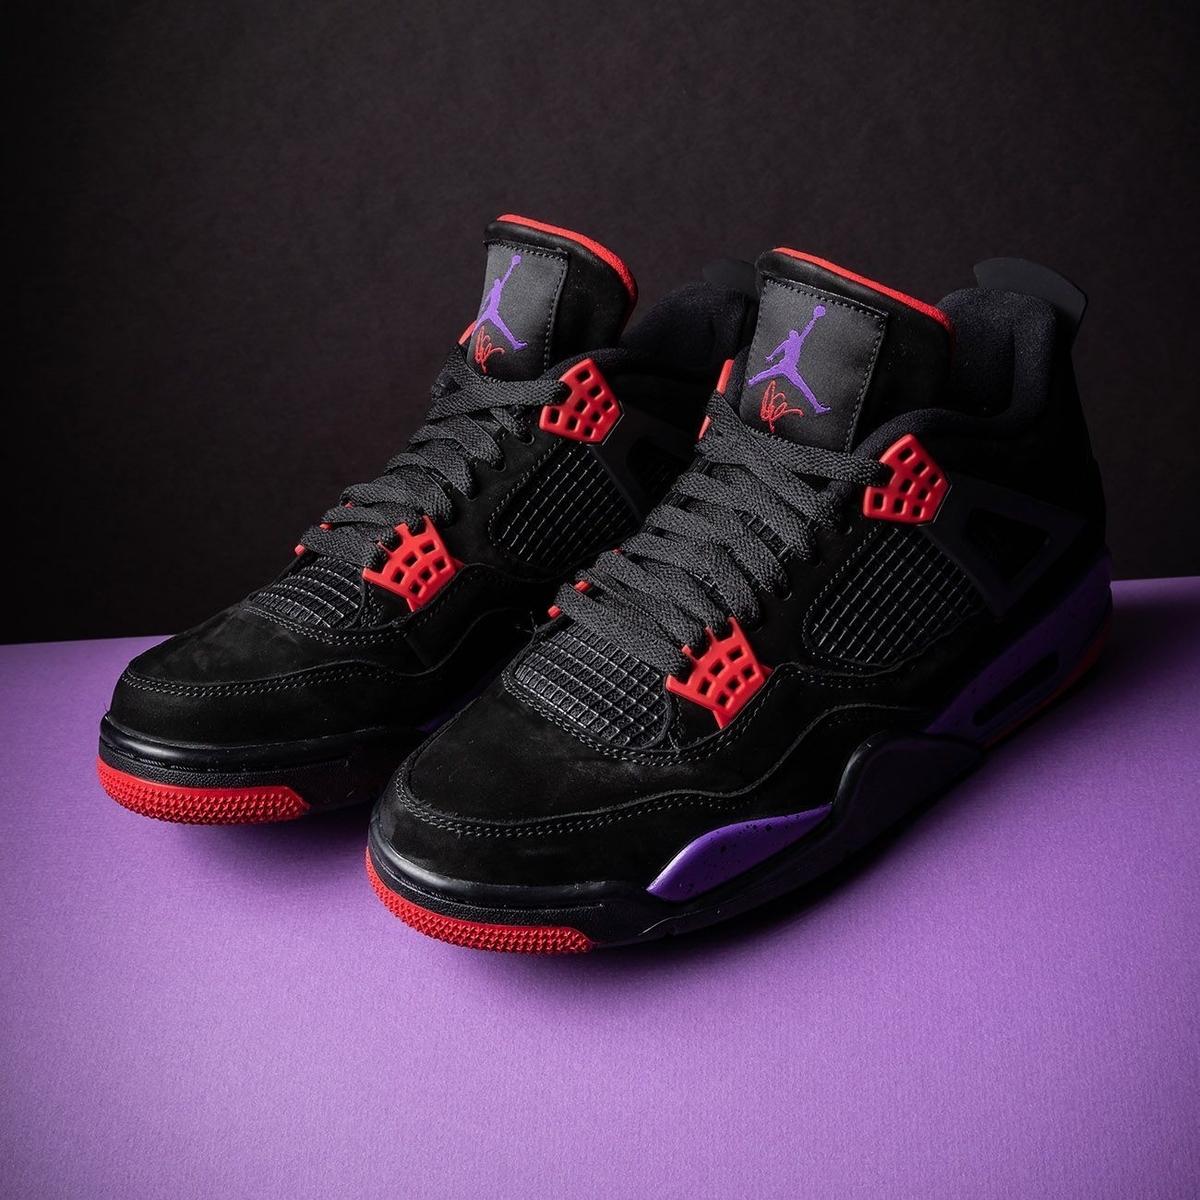 f:id:sneakerscaffetokyo:20191016124135j:plain